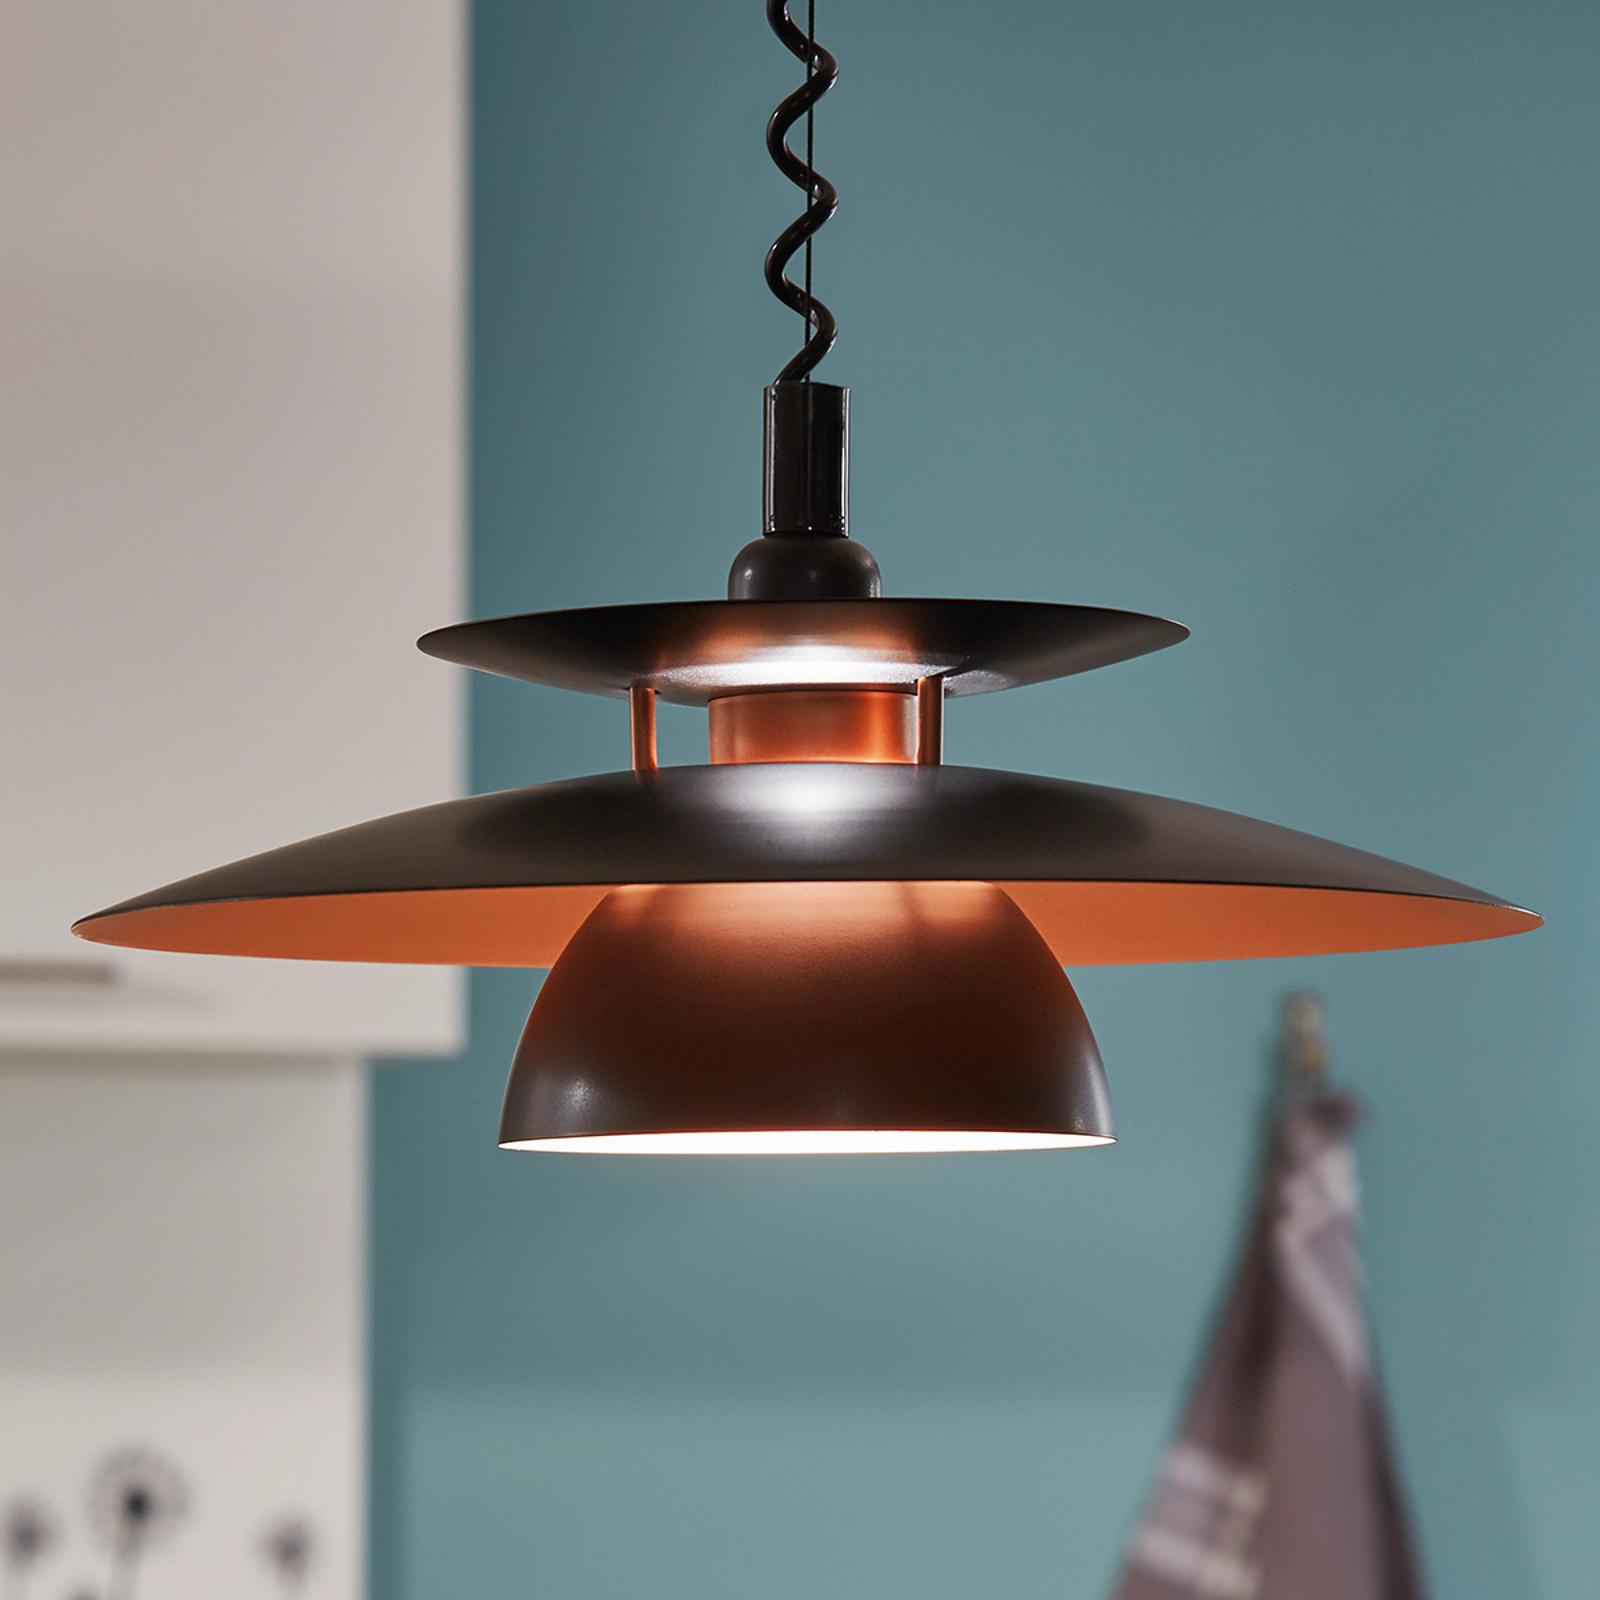 Brenda - a height-adjustable hanging light_3031753_1